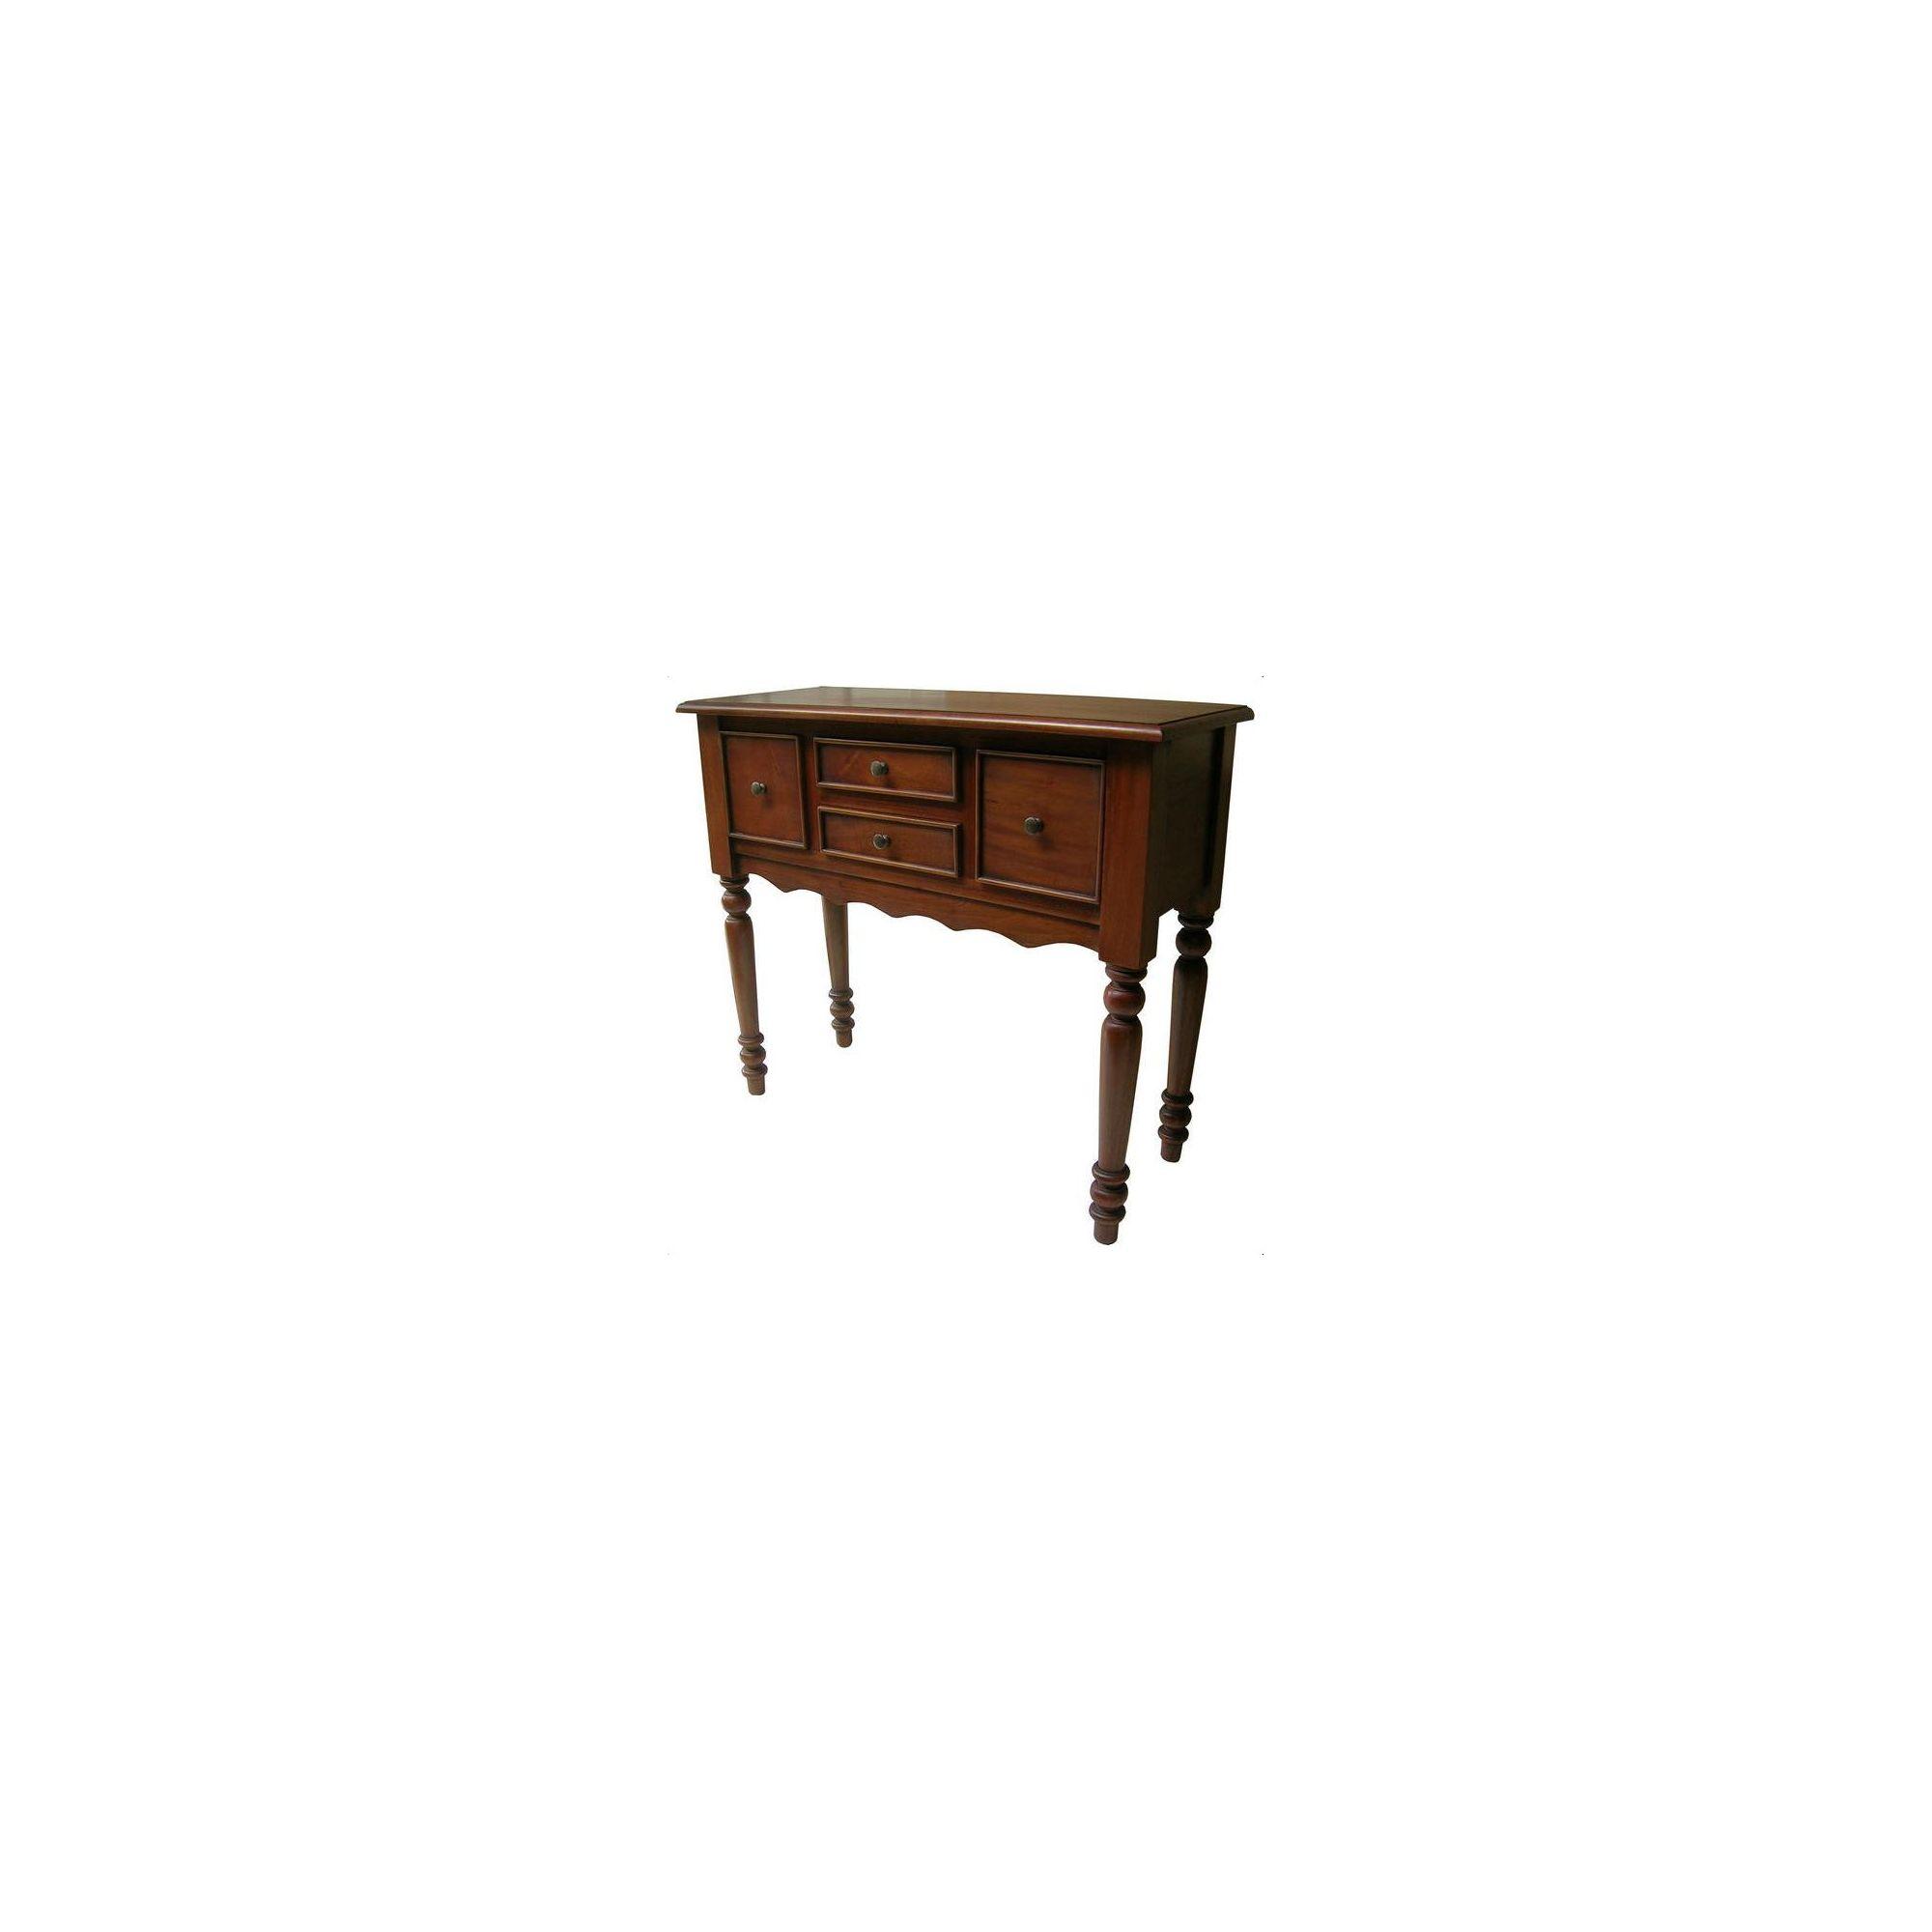 Lock stock and barrel Mahogany Victorian 4 Drawer Hall Table in Mahogany at Tesco Direct